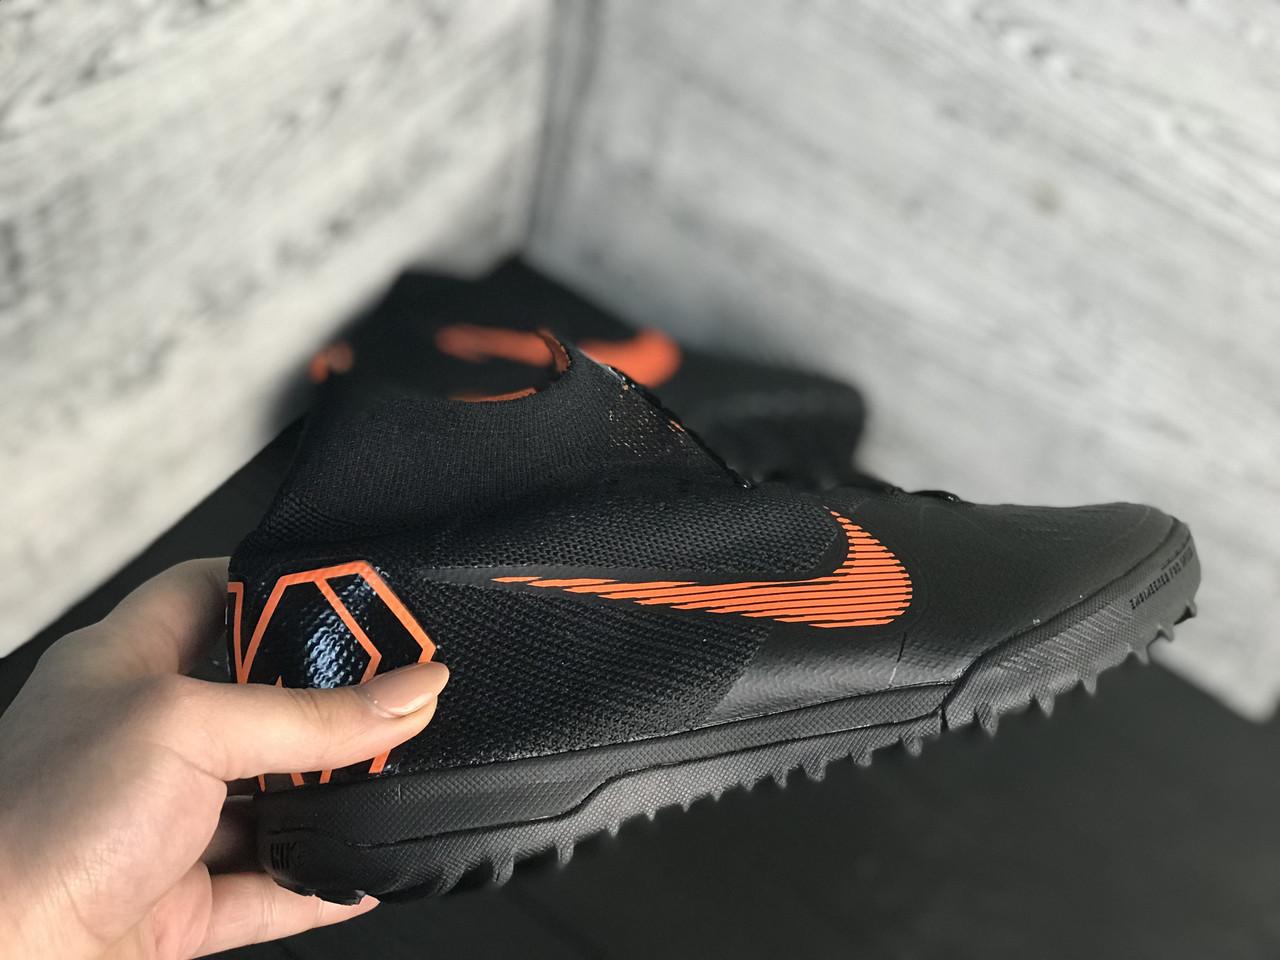 Сороконожки Nike Mercurial c носком /многошиповки(реплика)